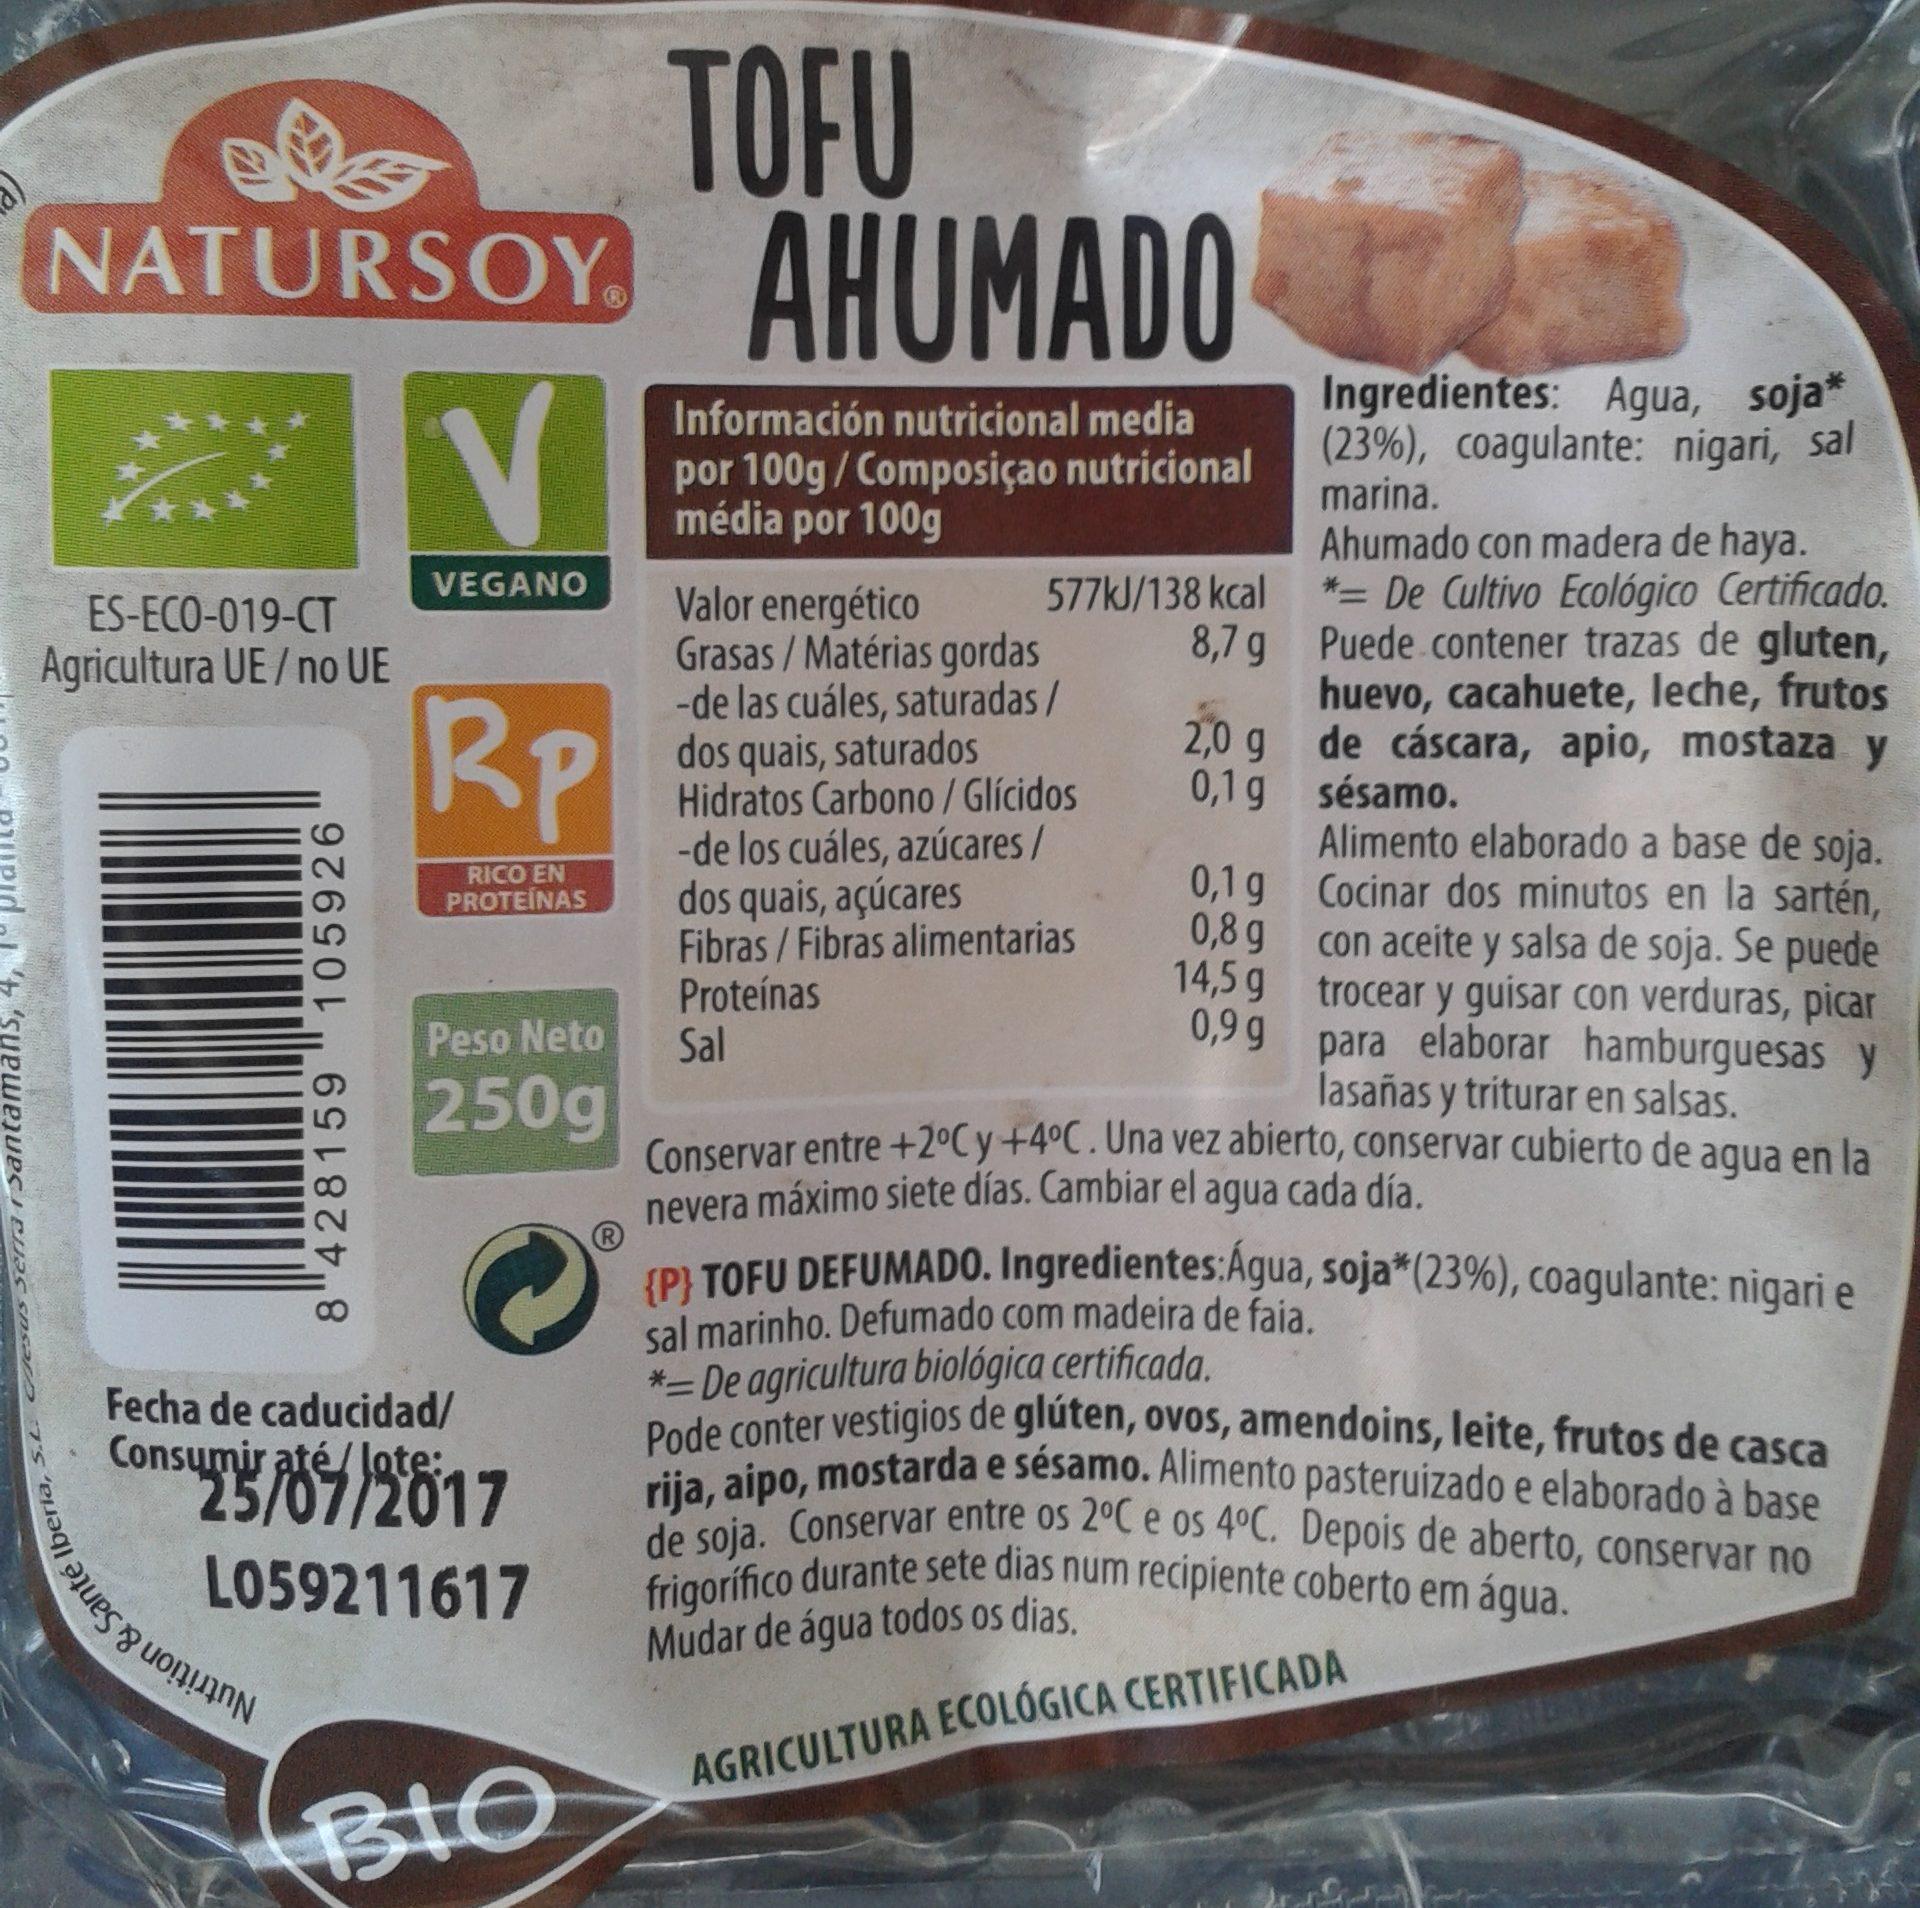 Tofu Ahumado Natursoy - Product